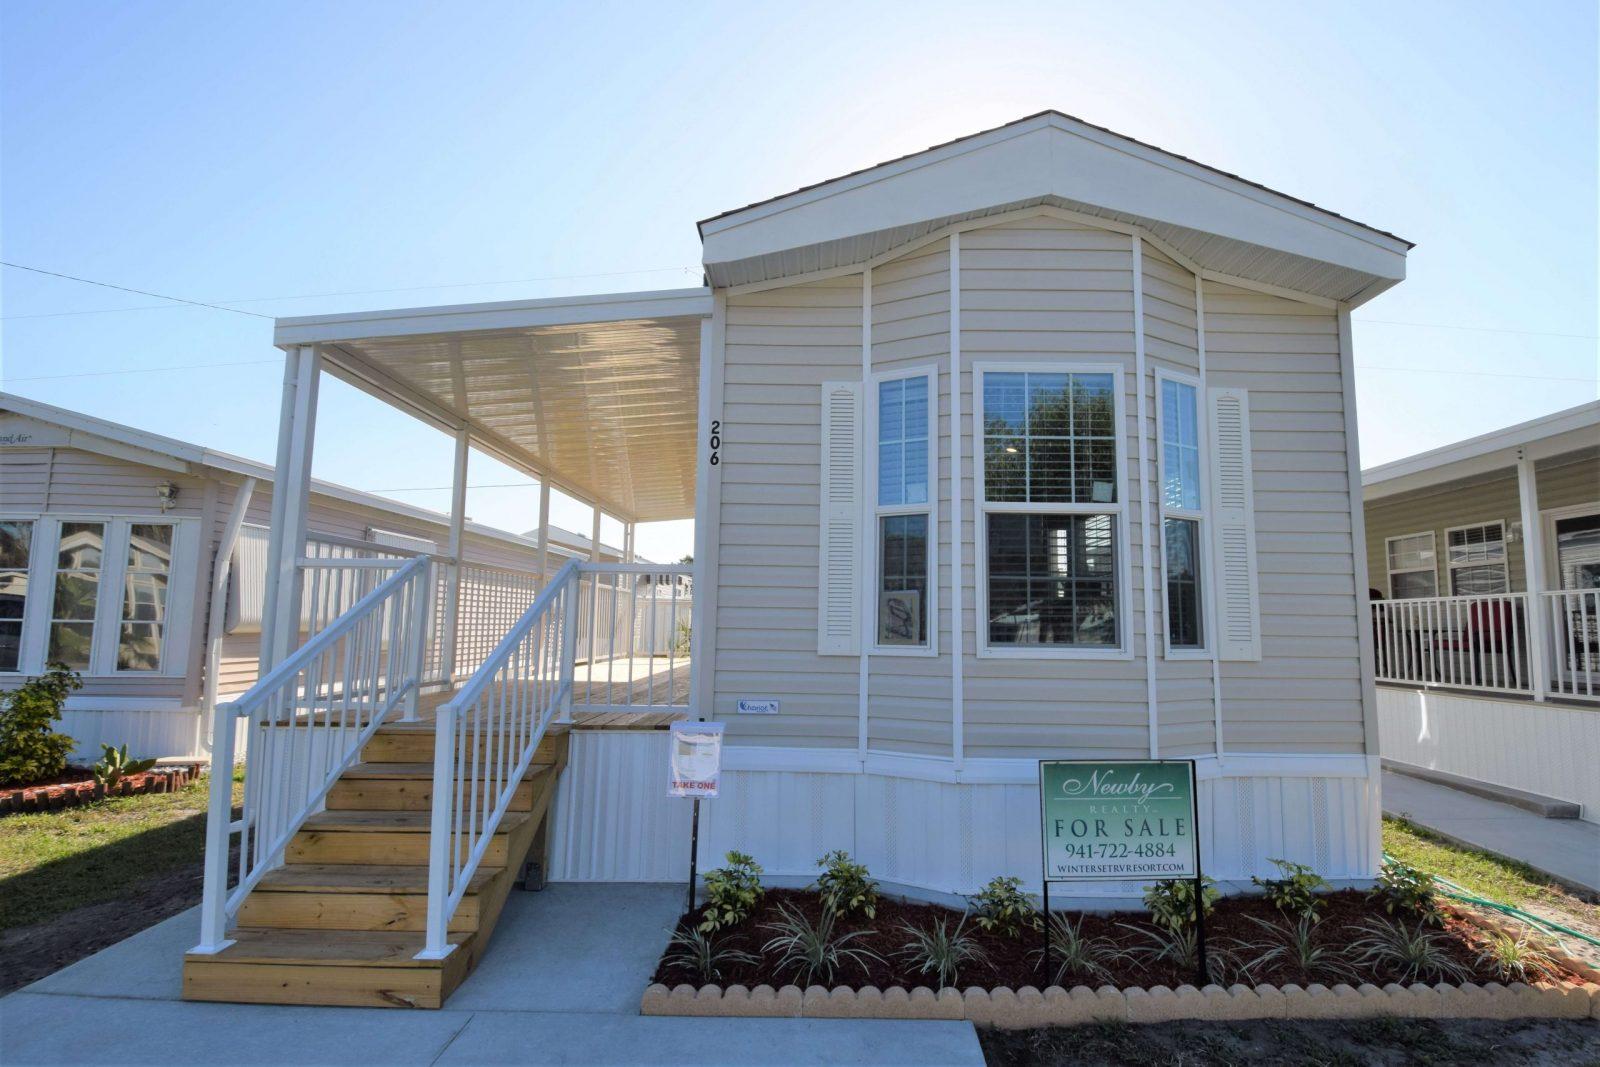 Park Model Home For Sale in Palmetto, Florida